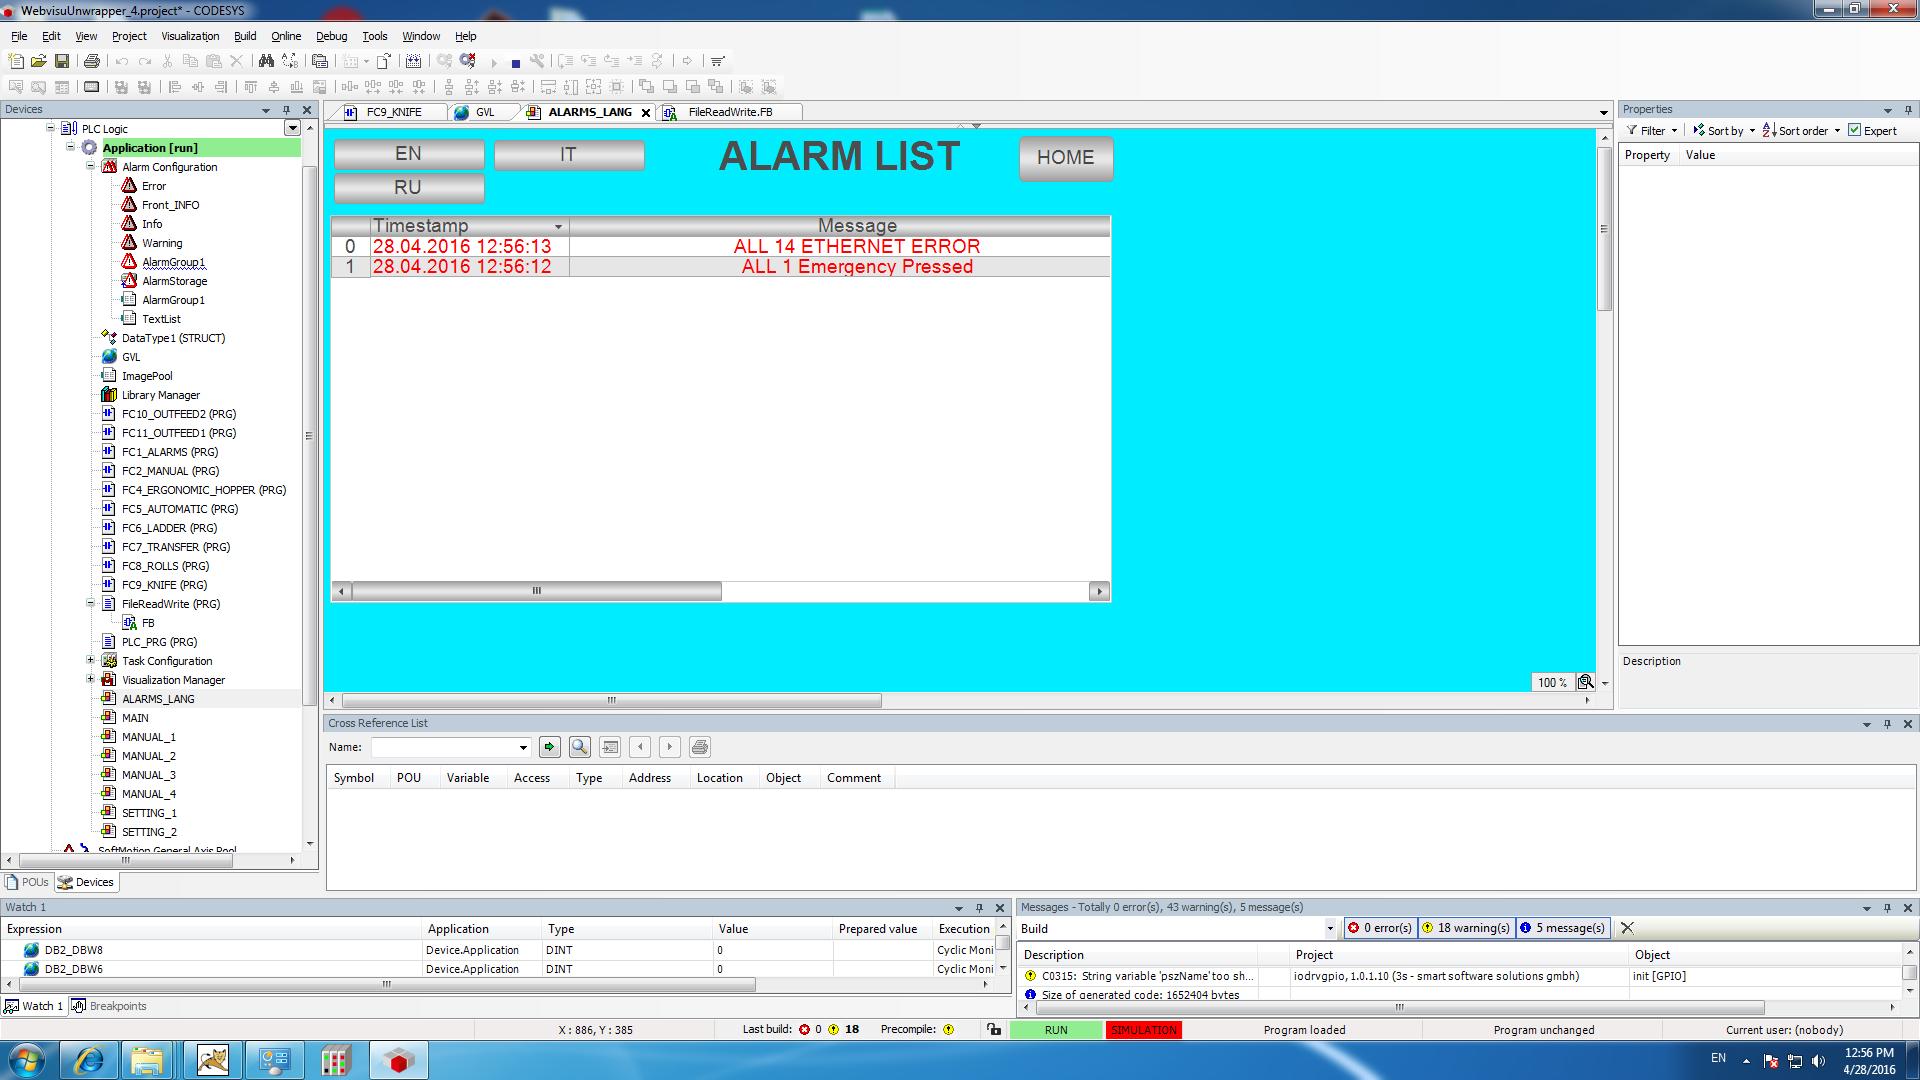 IMG: Alarm_list.png